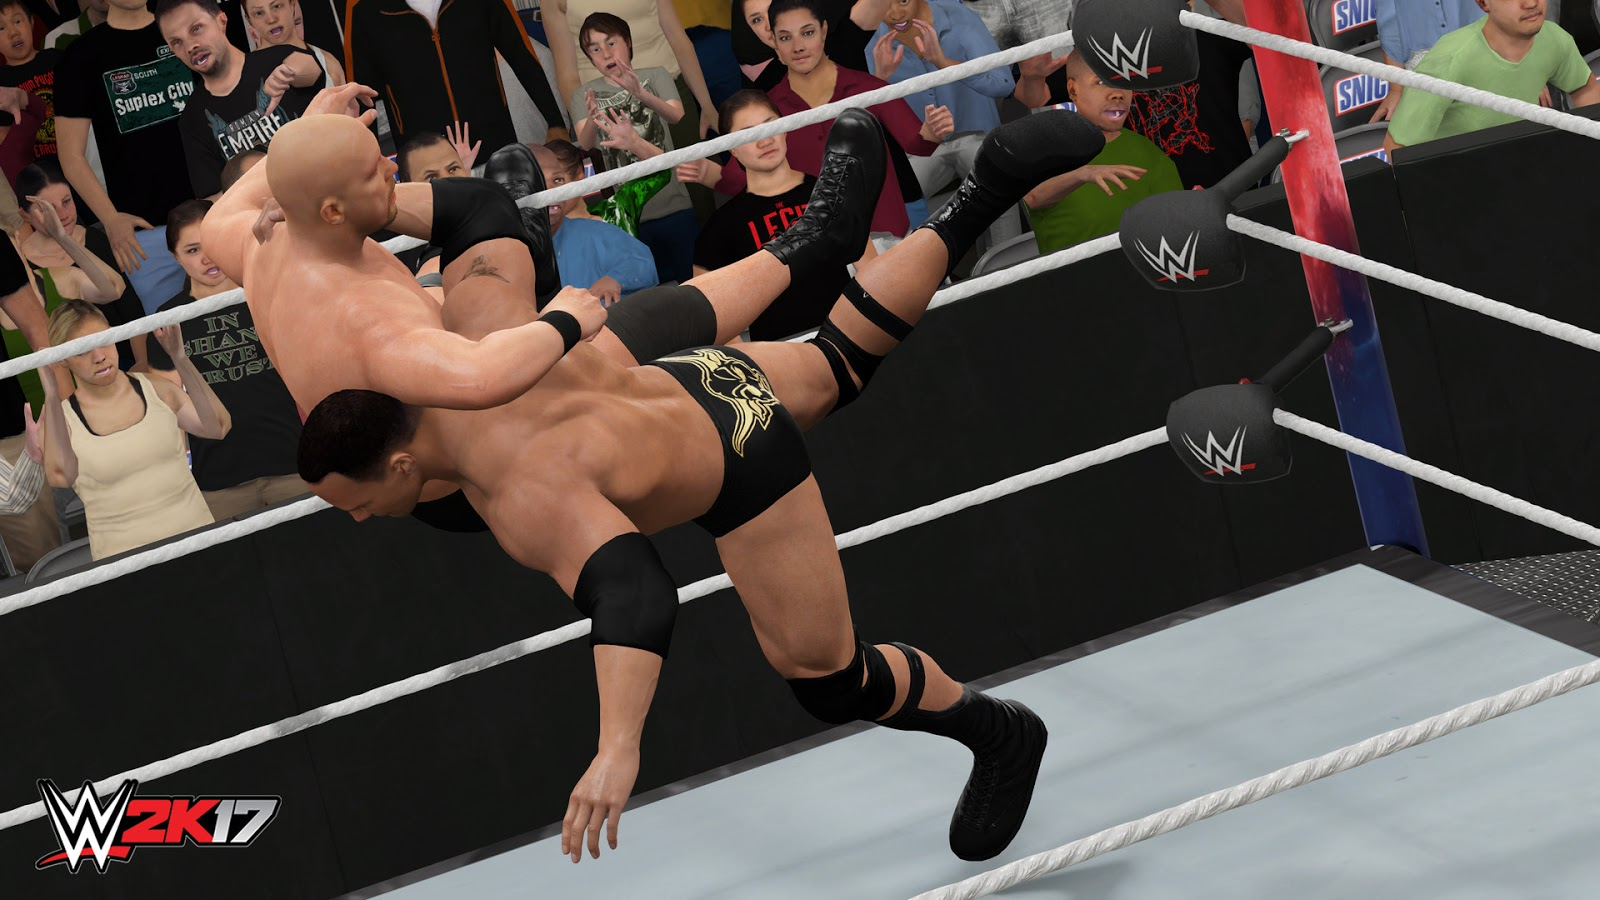 WWE 2K17 ESPAÑOL PC Descargar Full (CODEX) + REPACK 10 DVD5 (JPW) 8